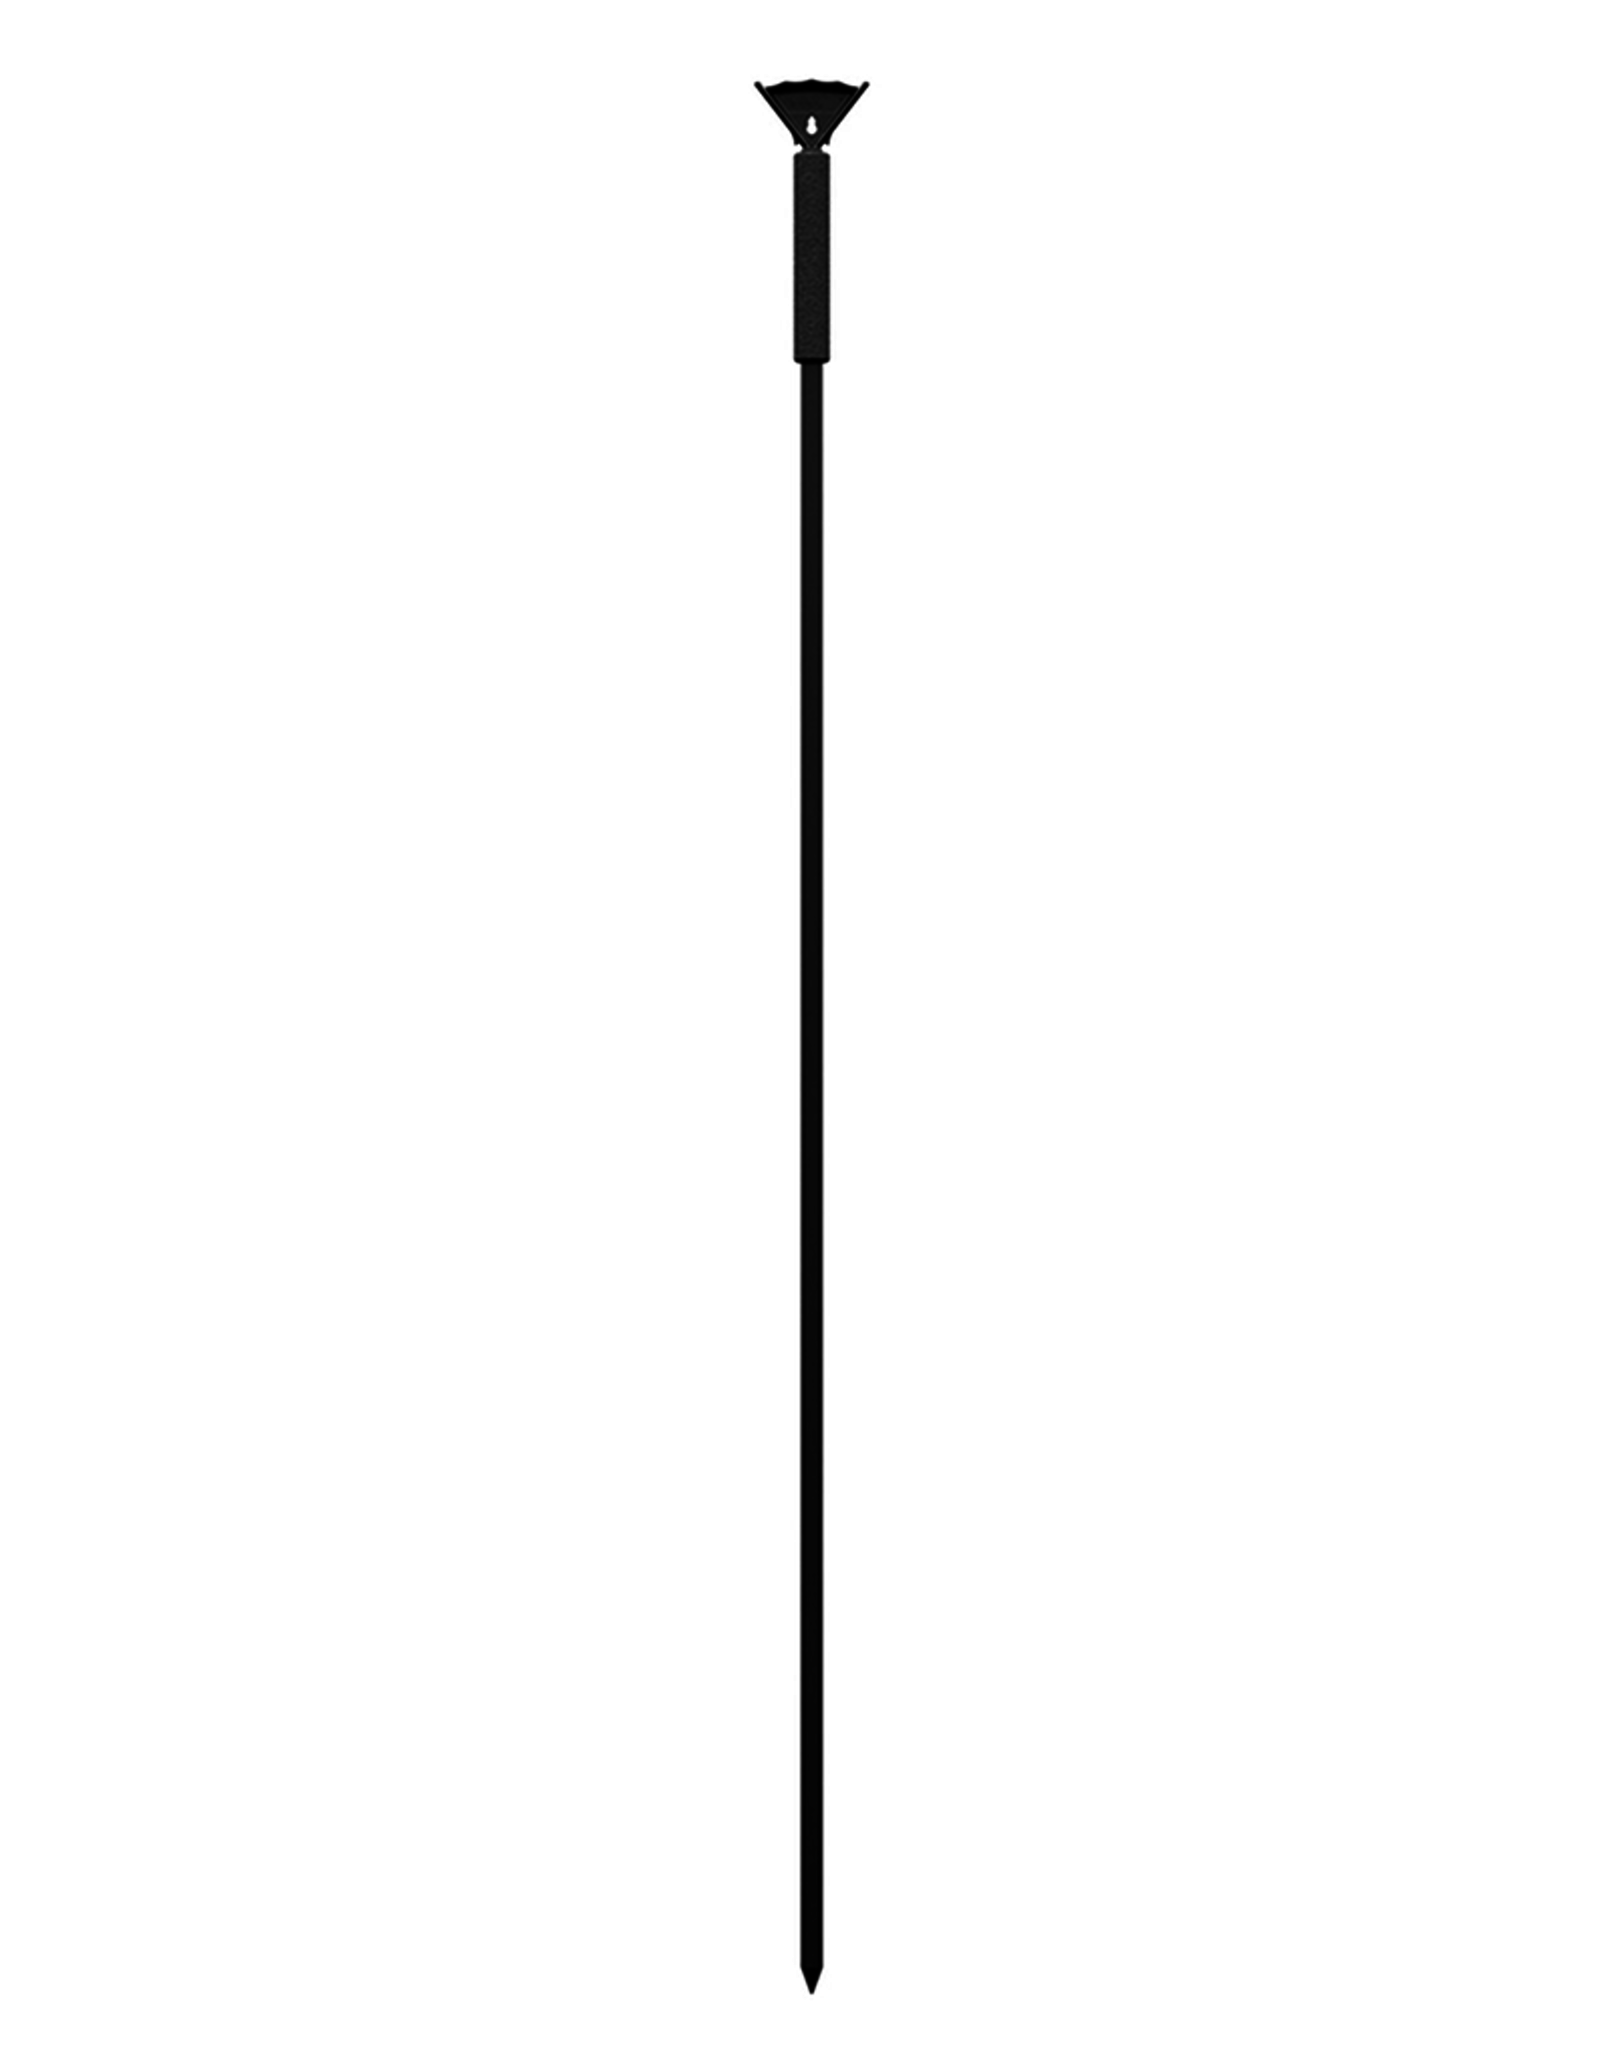 YakAttack ParkNPole 6' Stakeout Pole